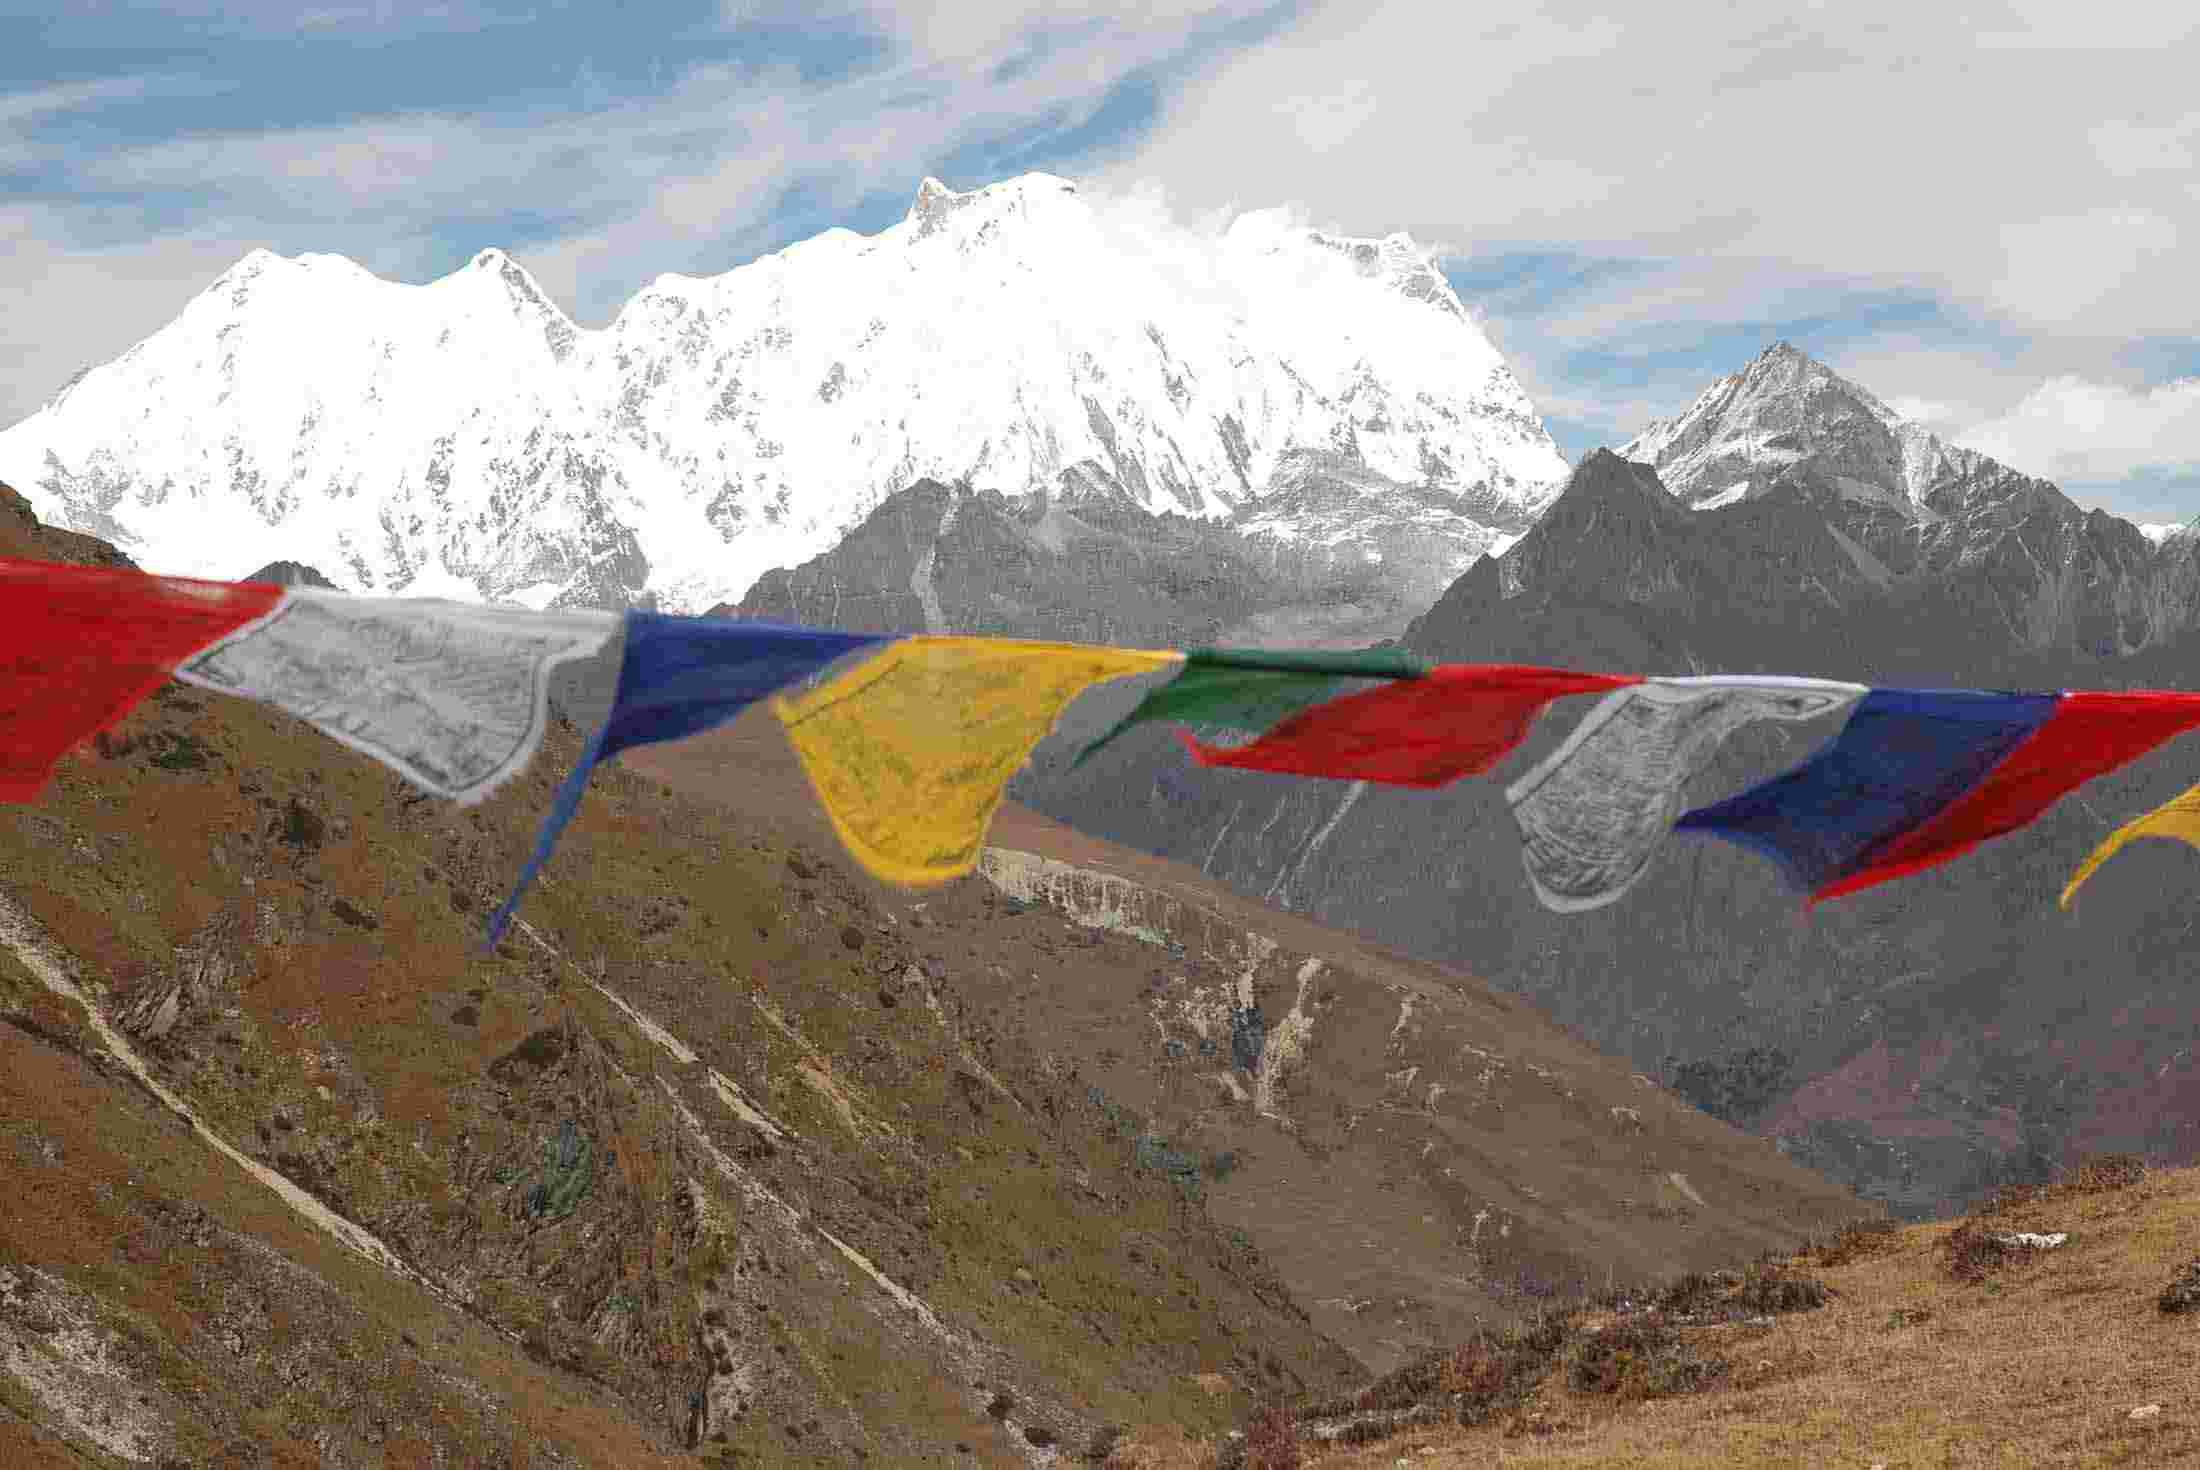 Bhutan Tours, Travel & Trips | Peregrine Adventures US